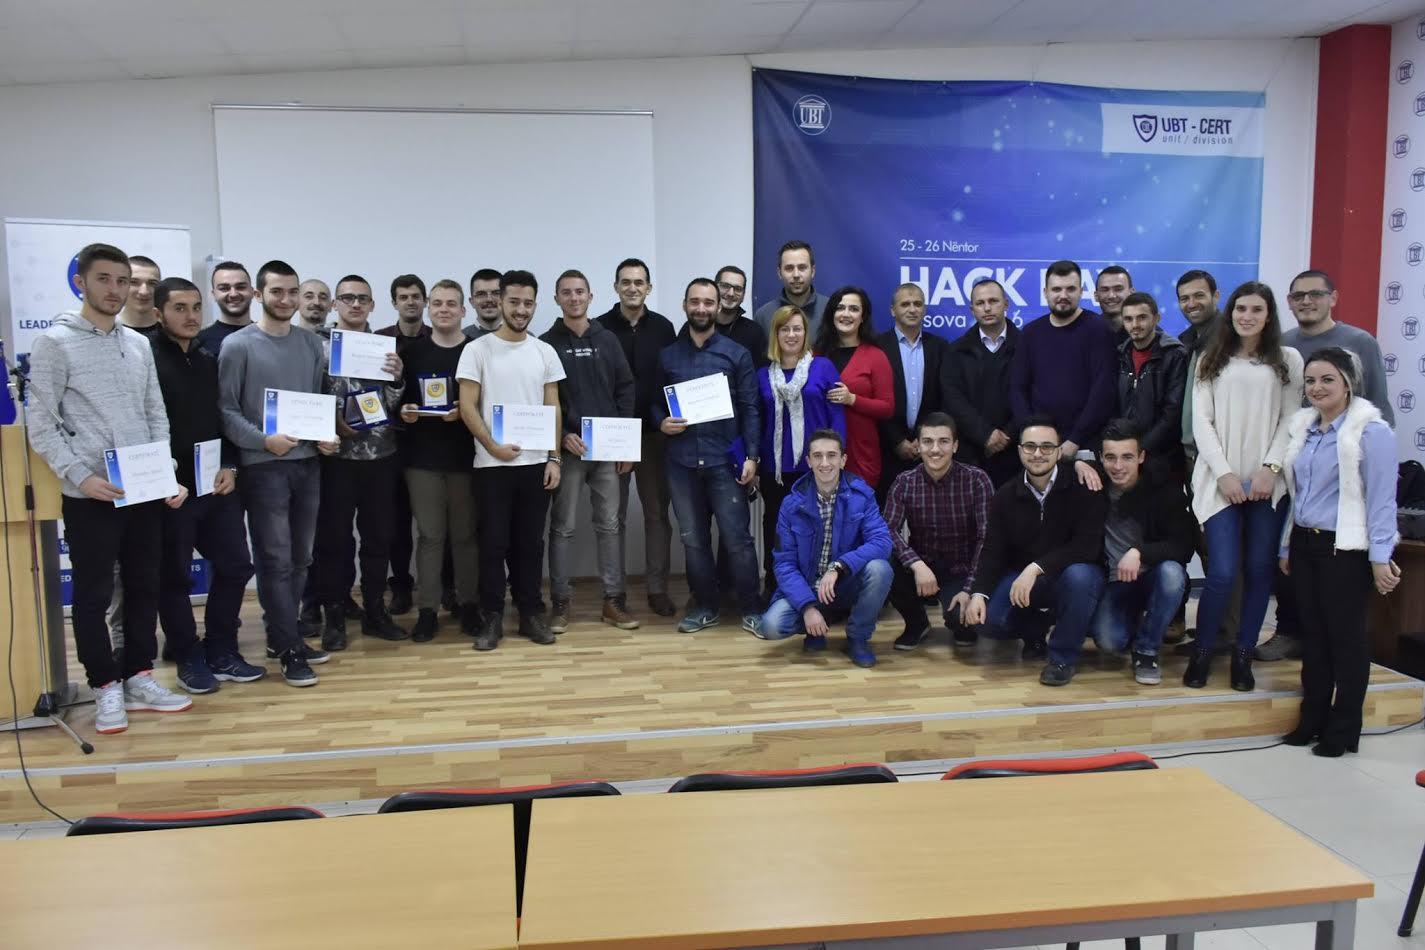 "UBT shpërblen fituesit e ""Hack Day Kosova 2016"""